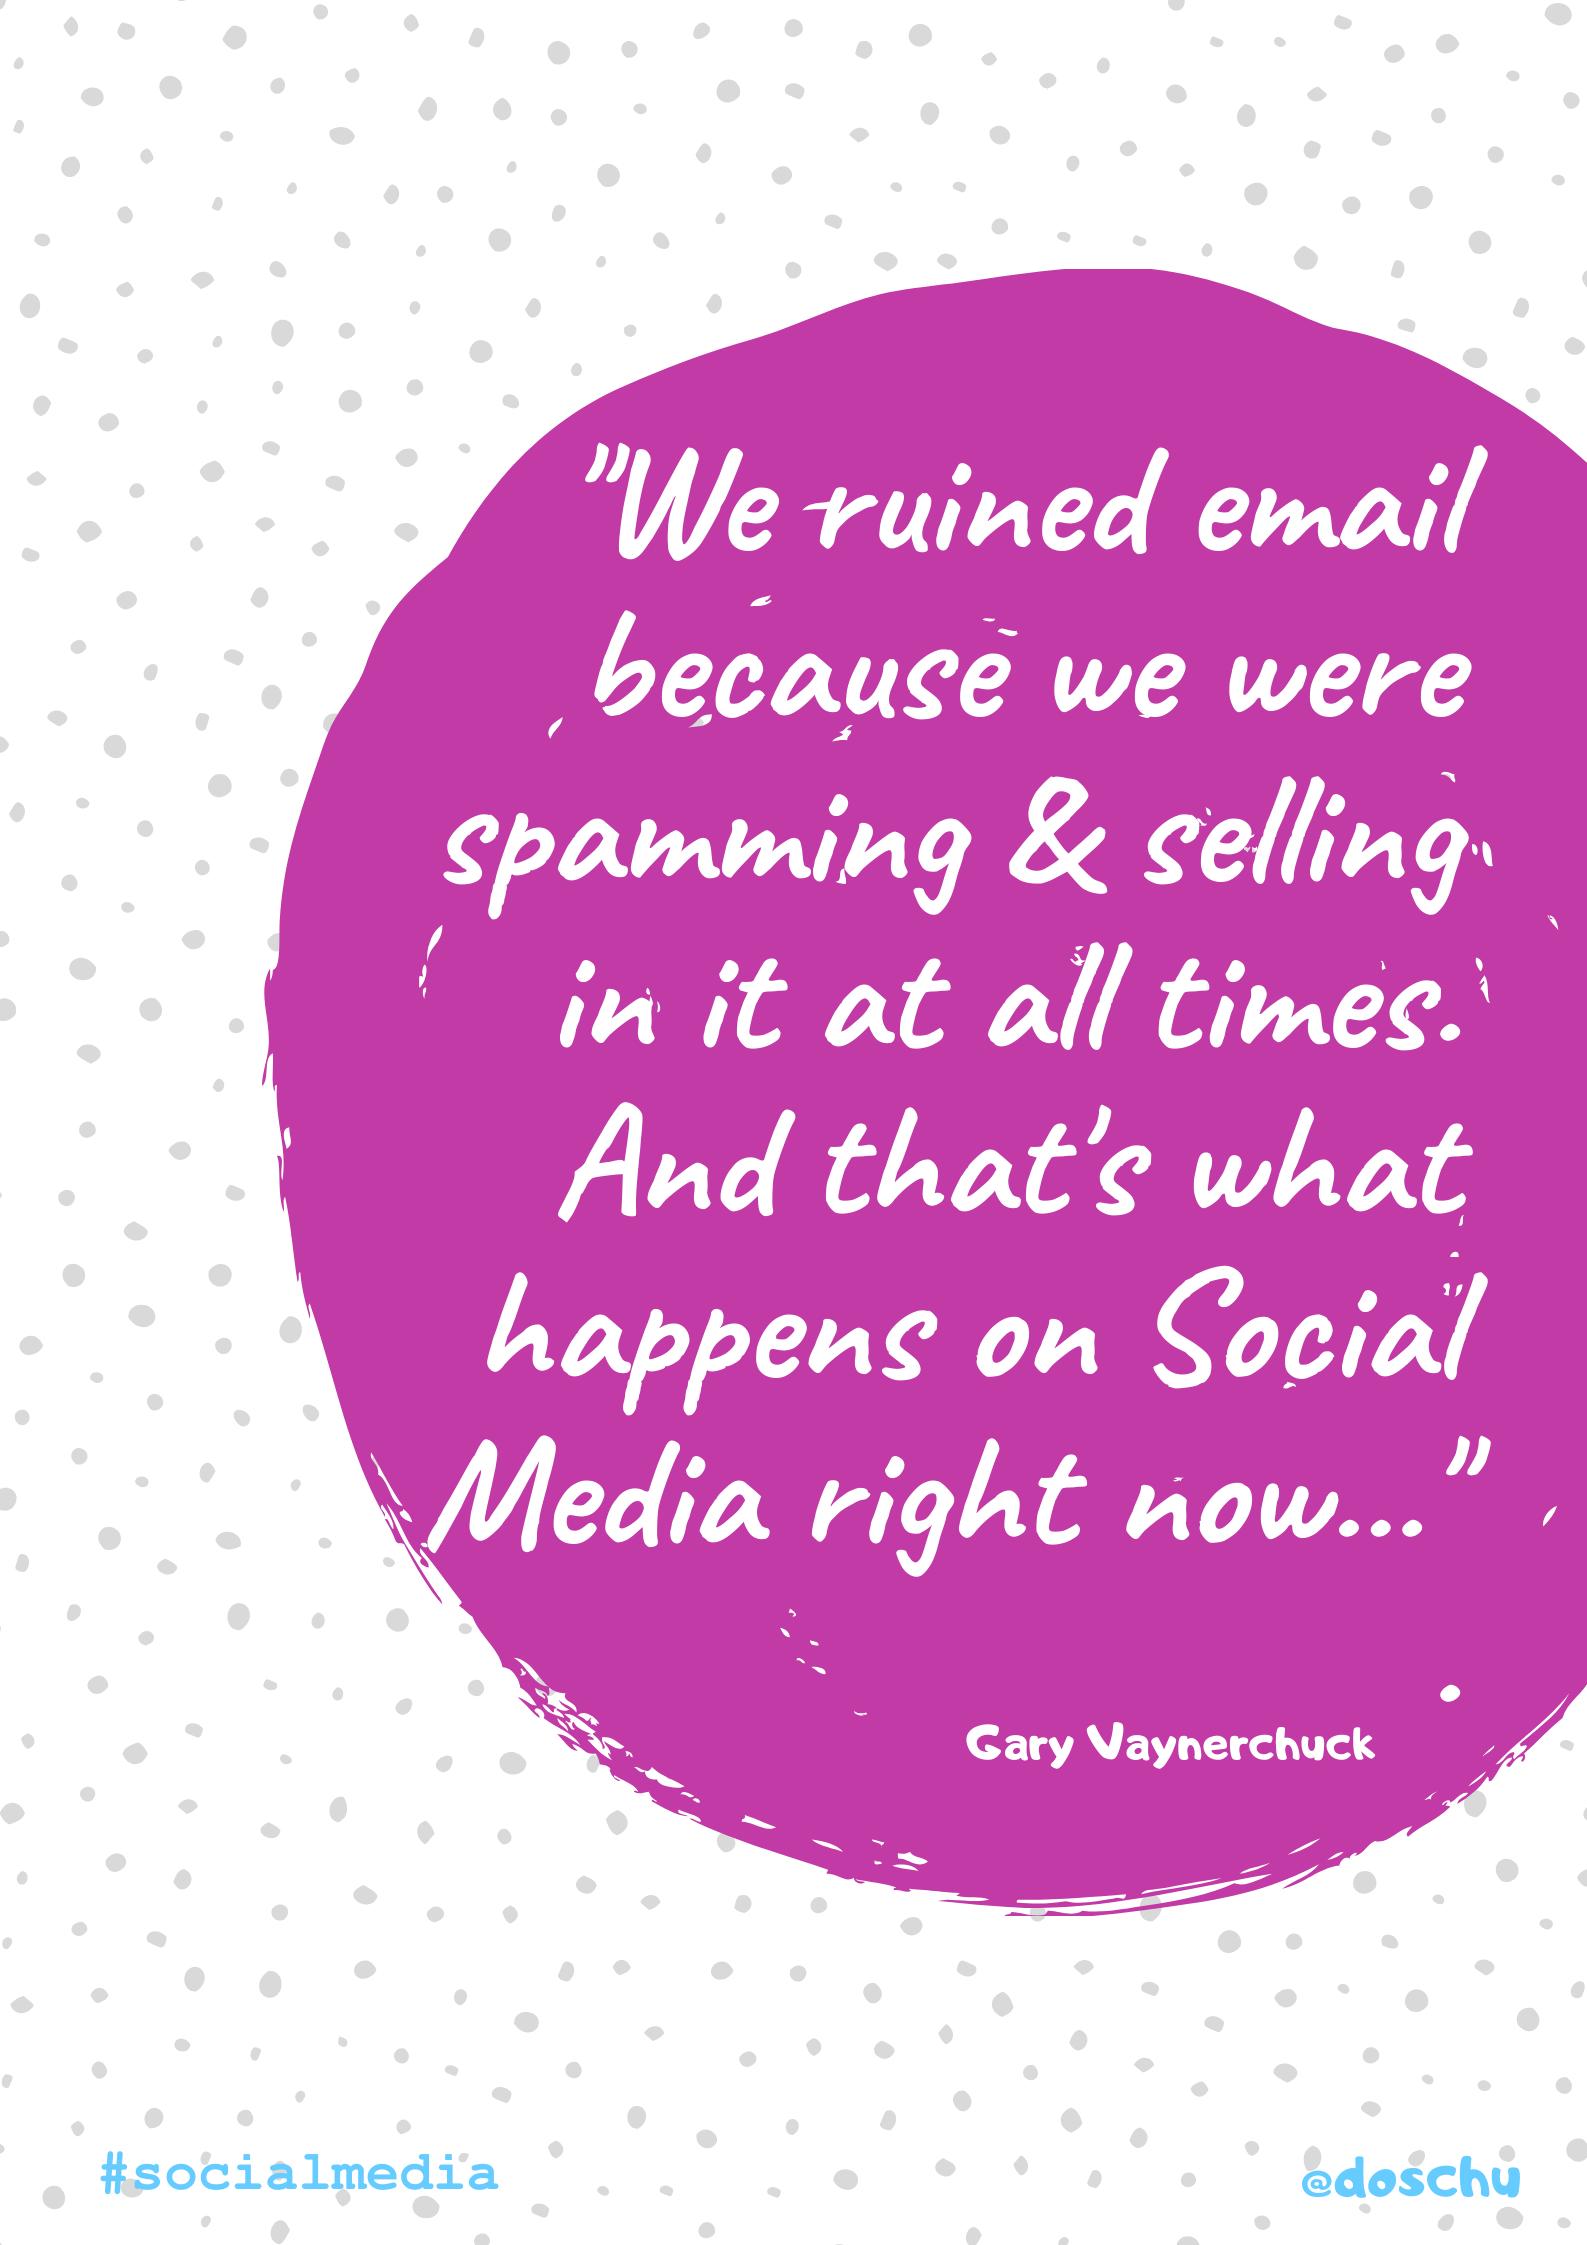 Zitat Gary Vaynerchuck: eMail's death